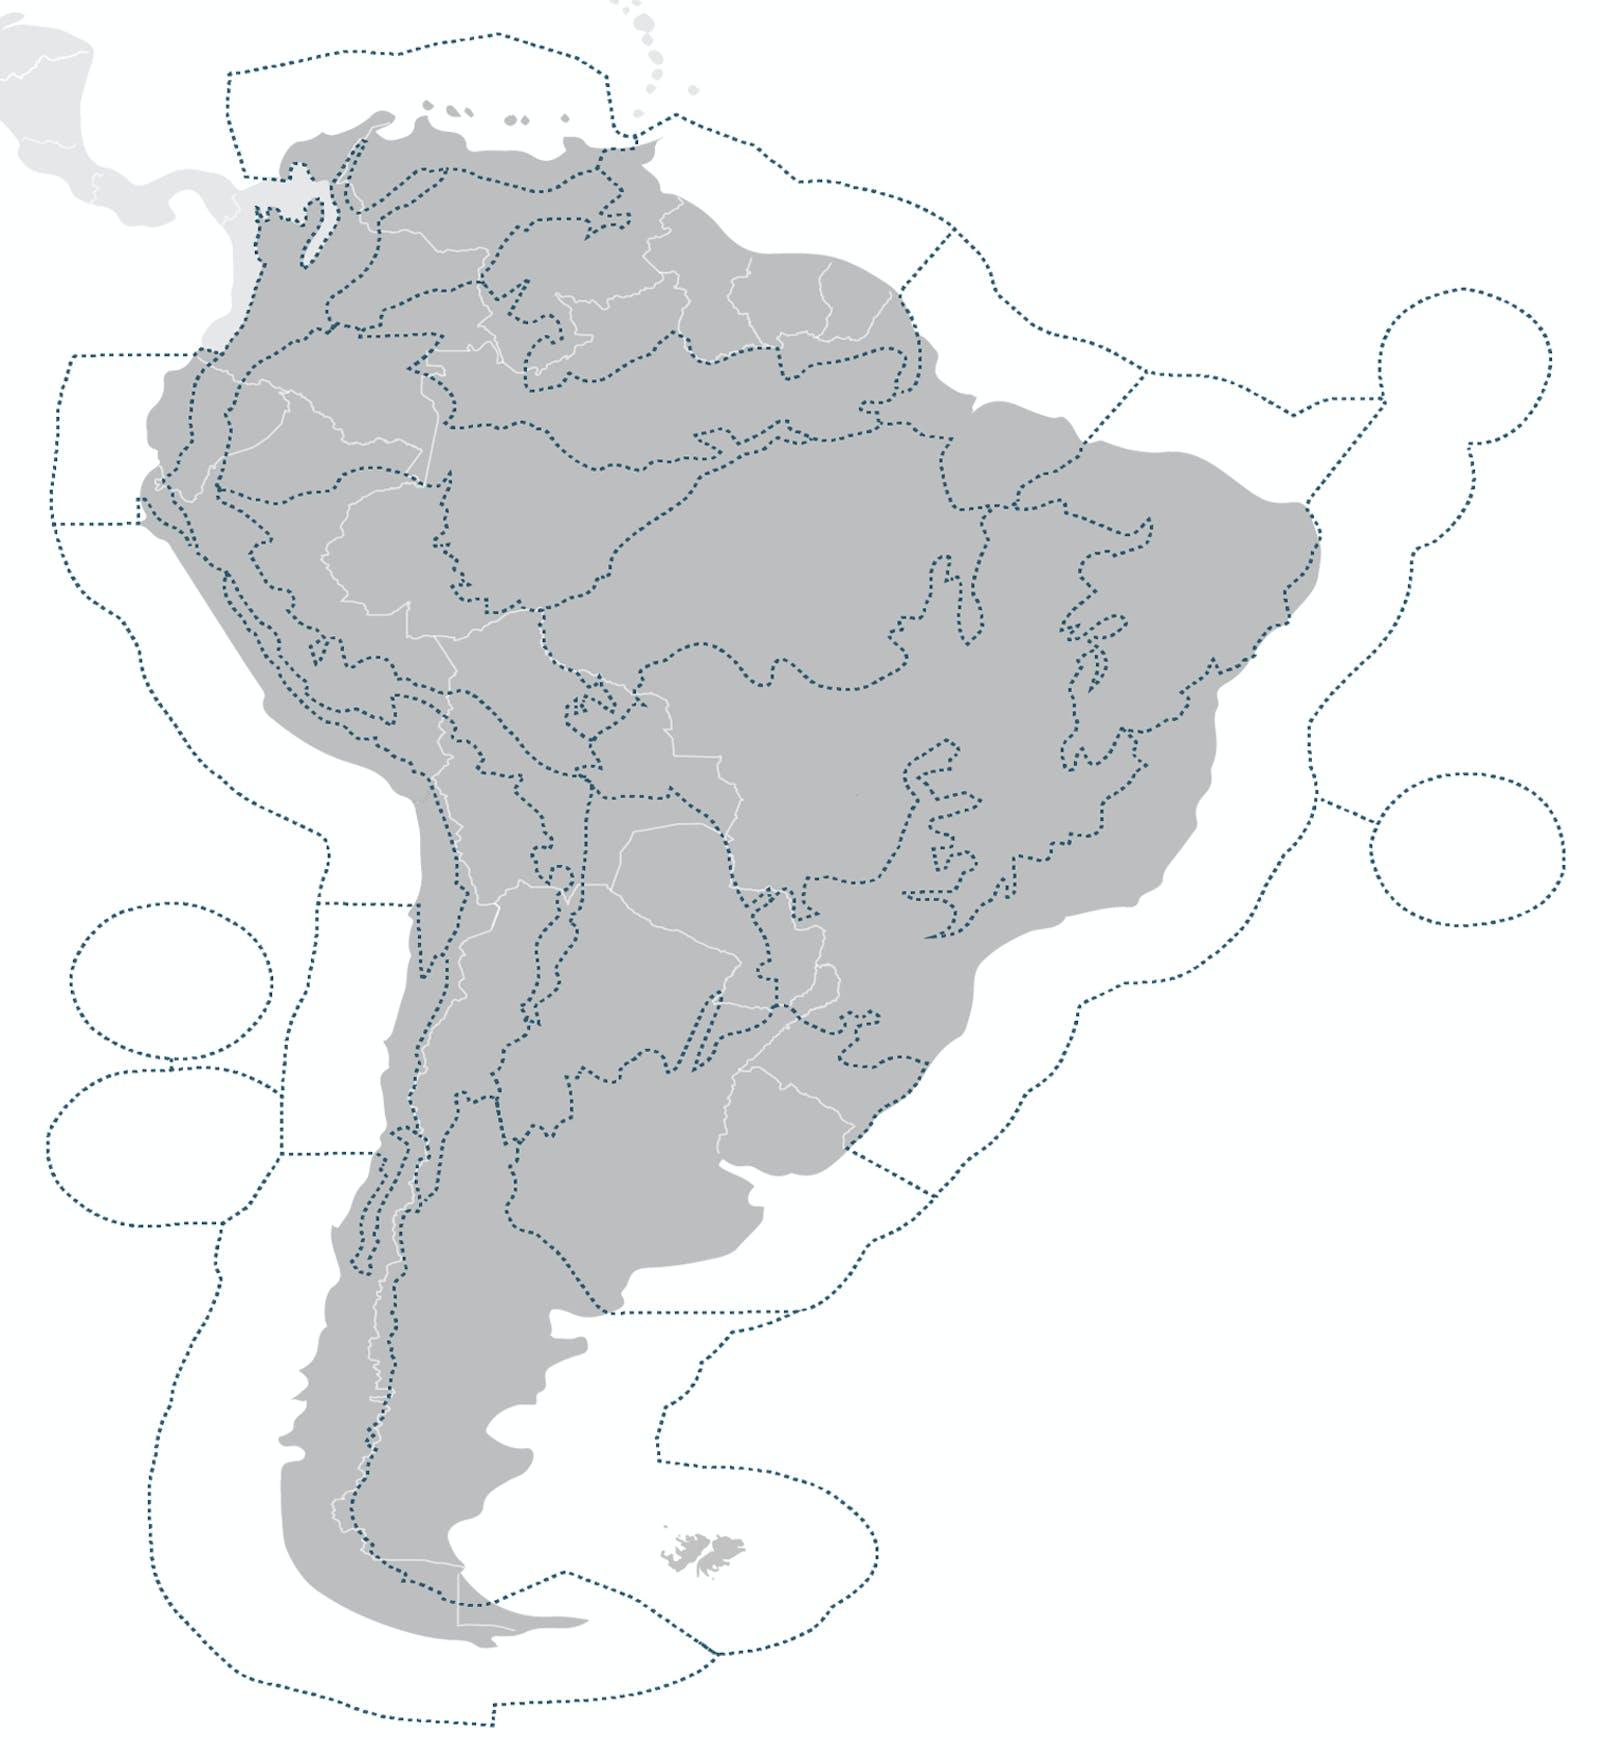 Southern America